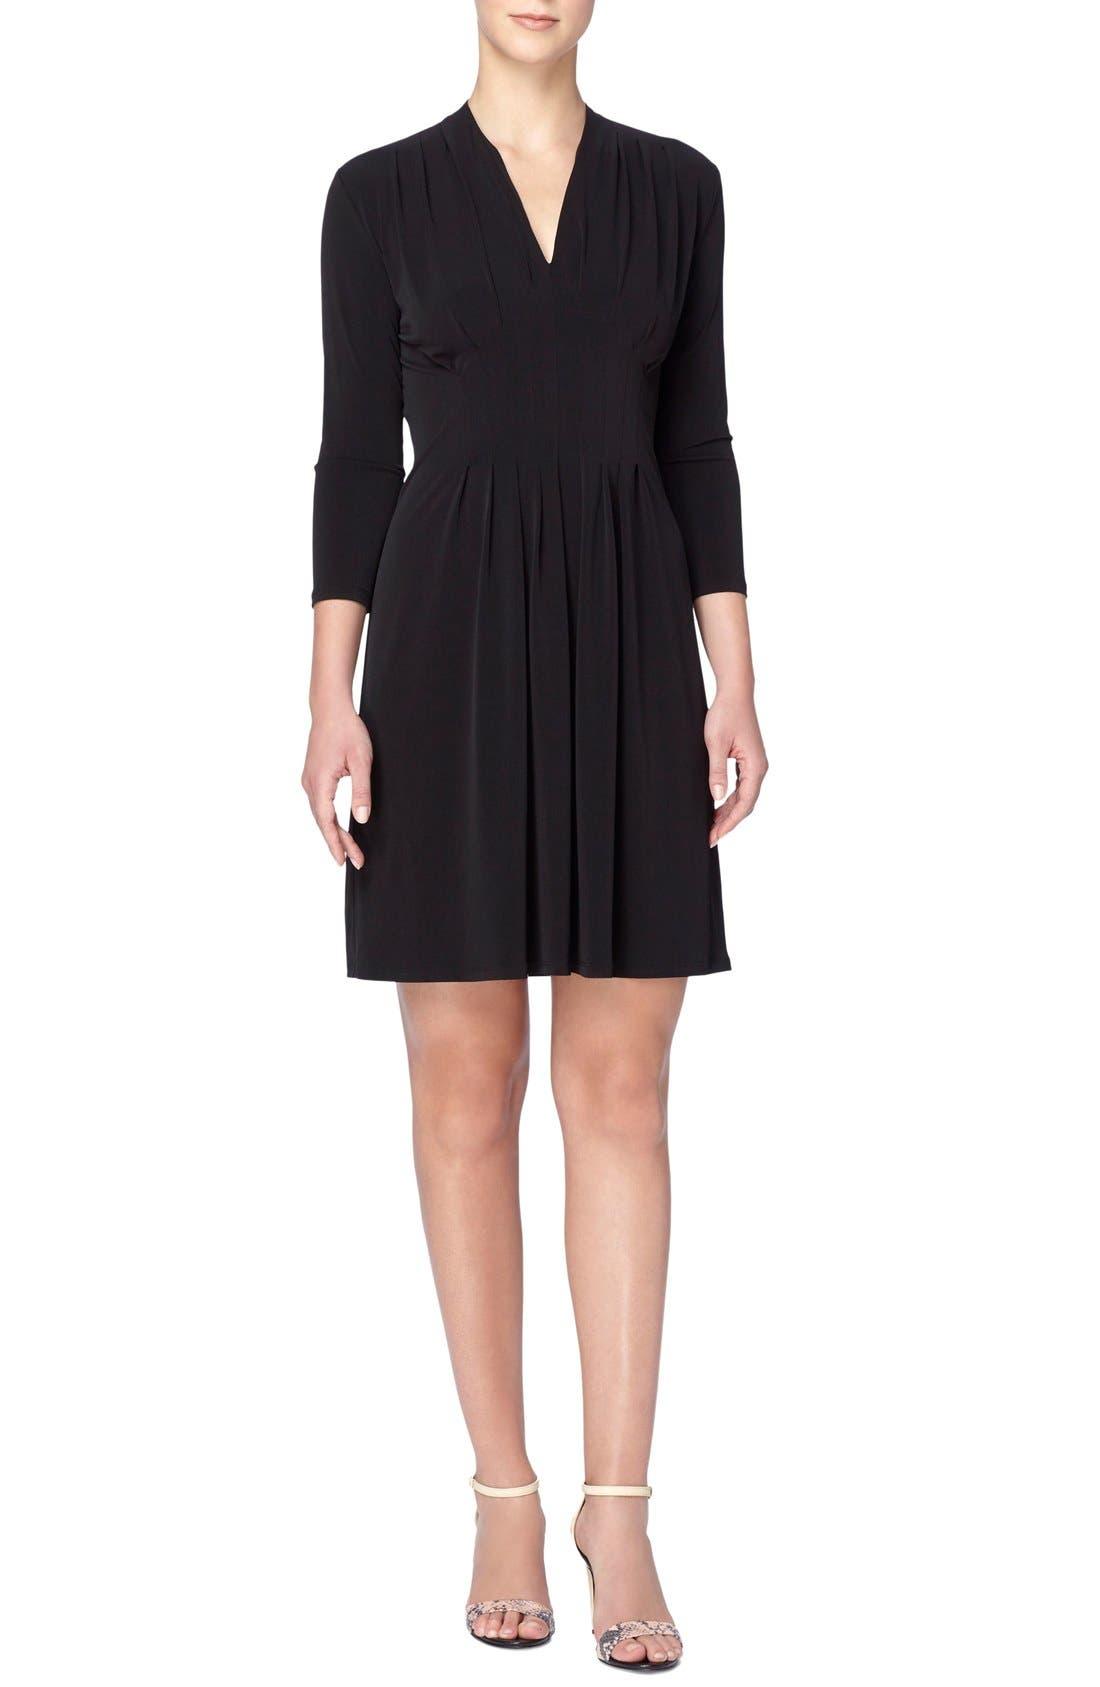 Catherine Catherine Malandrino 'Tinka' Jersey V-Neck Fit & Flare Dress